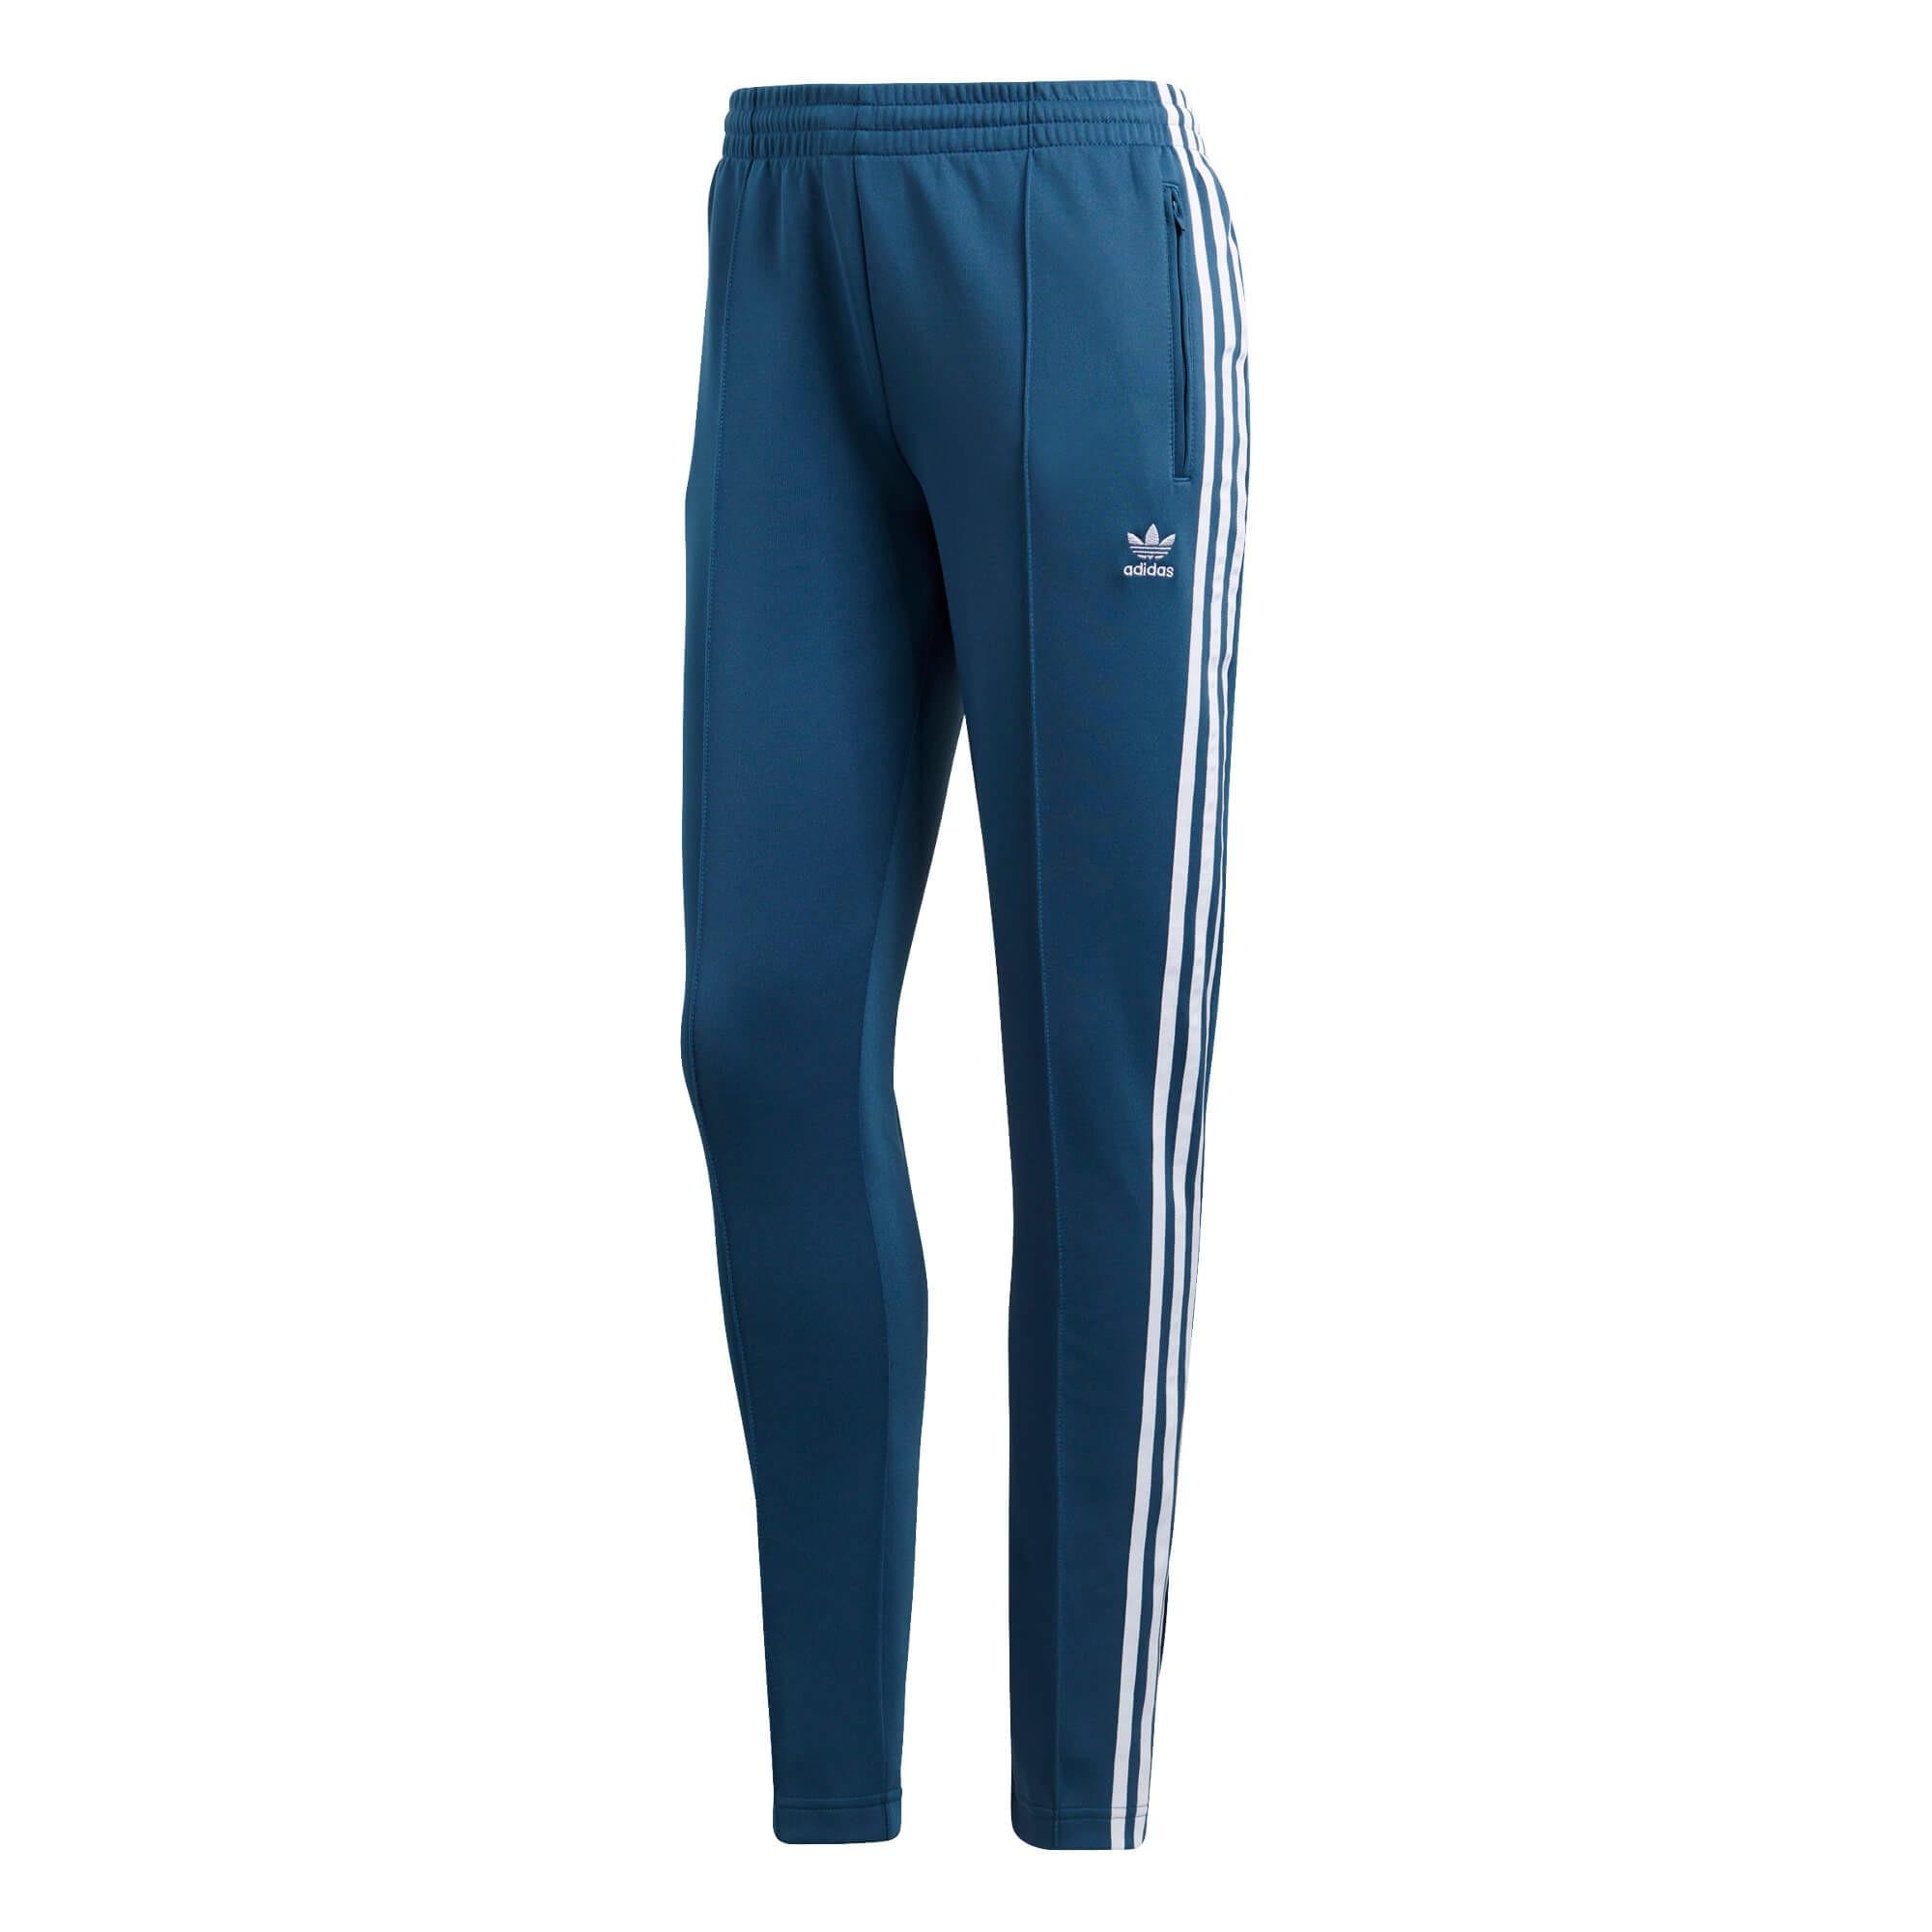 De Mujer Deportes Adidas Moya Pantalón Tp Venta Sst Azul dS0xYwq